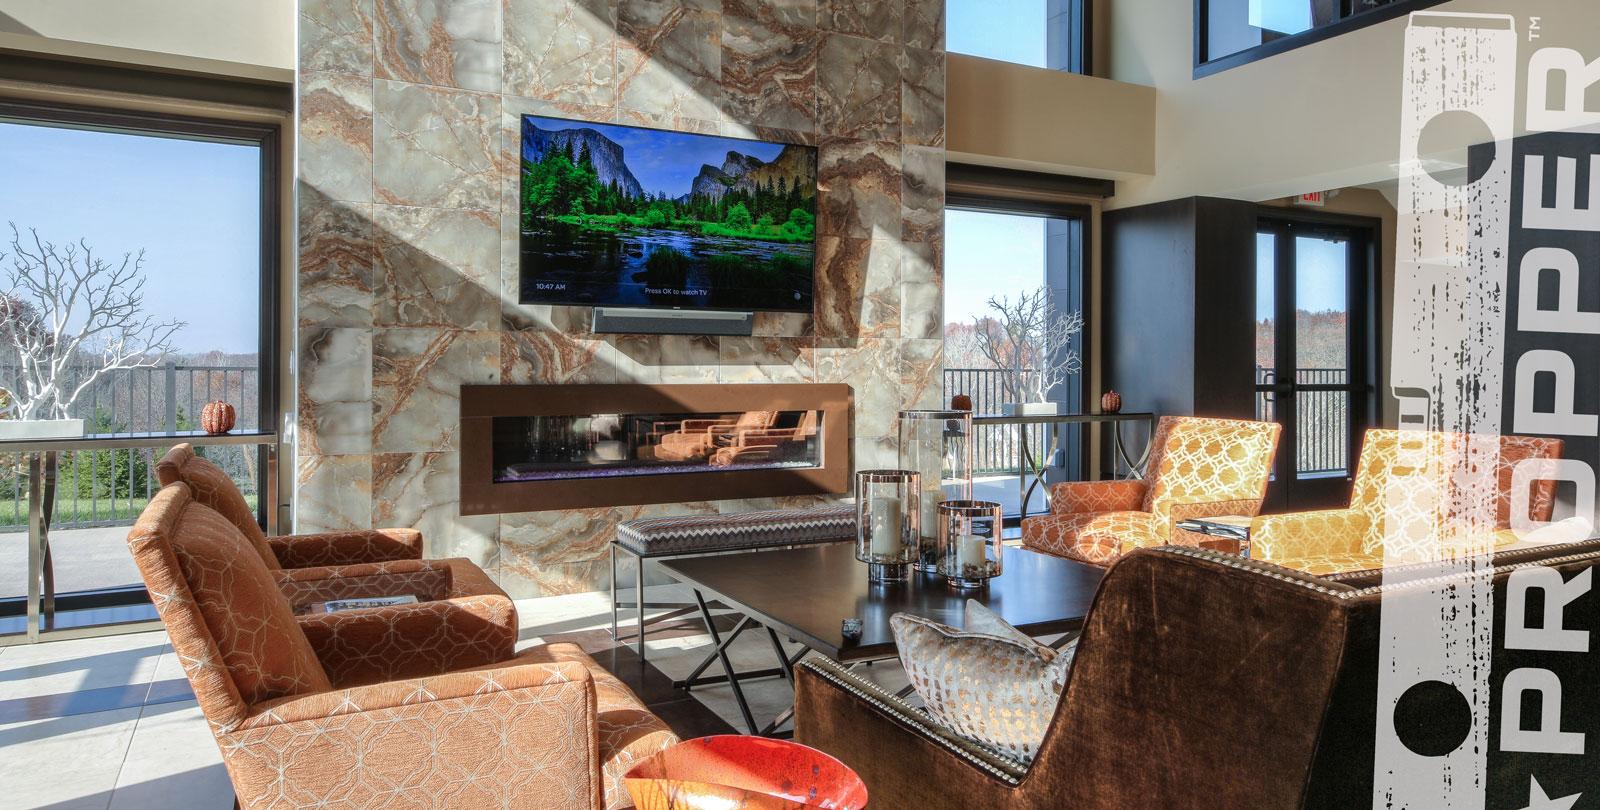 Ultra-luxury apartments - On schedule. Under budget.